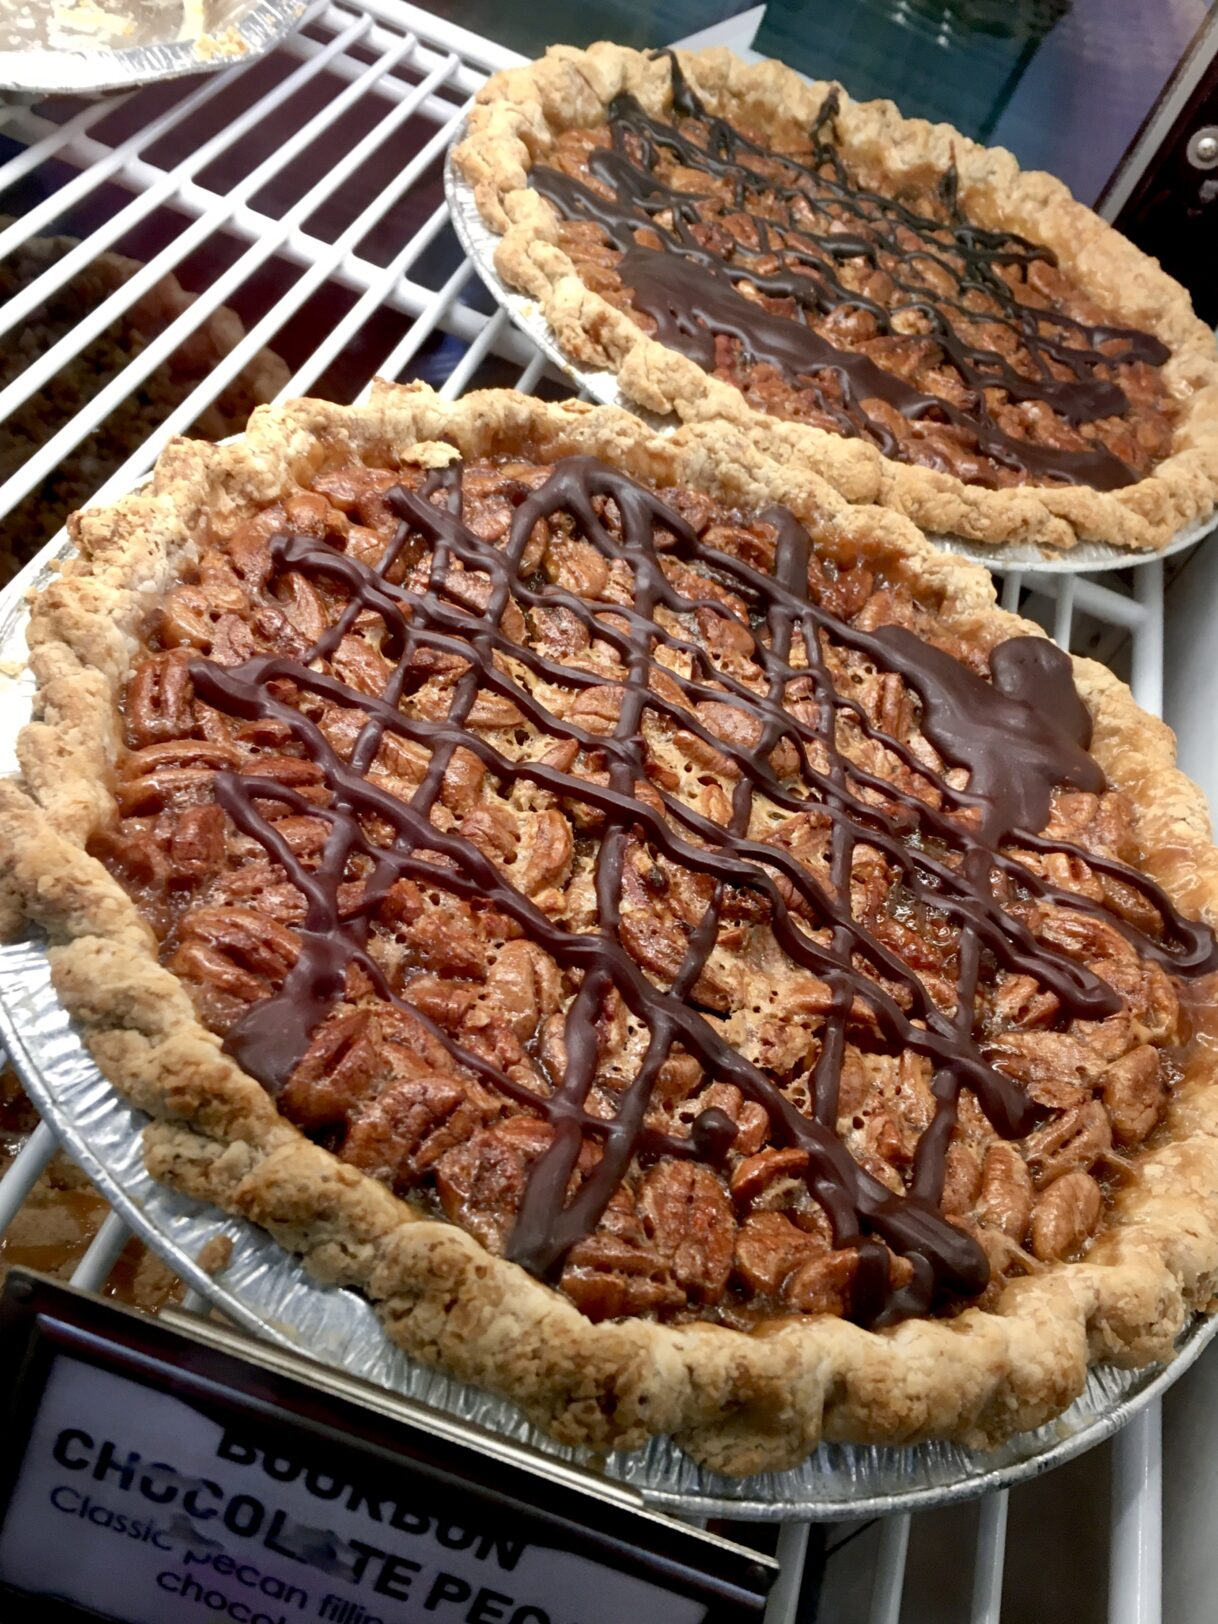 Bourbon Chocolate Pecan Pie at Pie Bar – Woodstock, Georgia – 12/05/2020